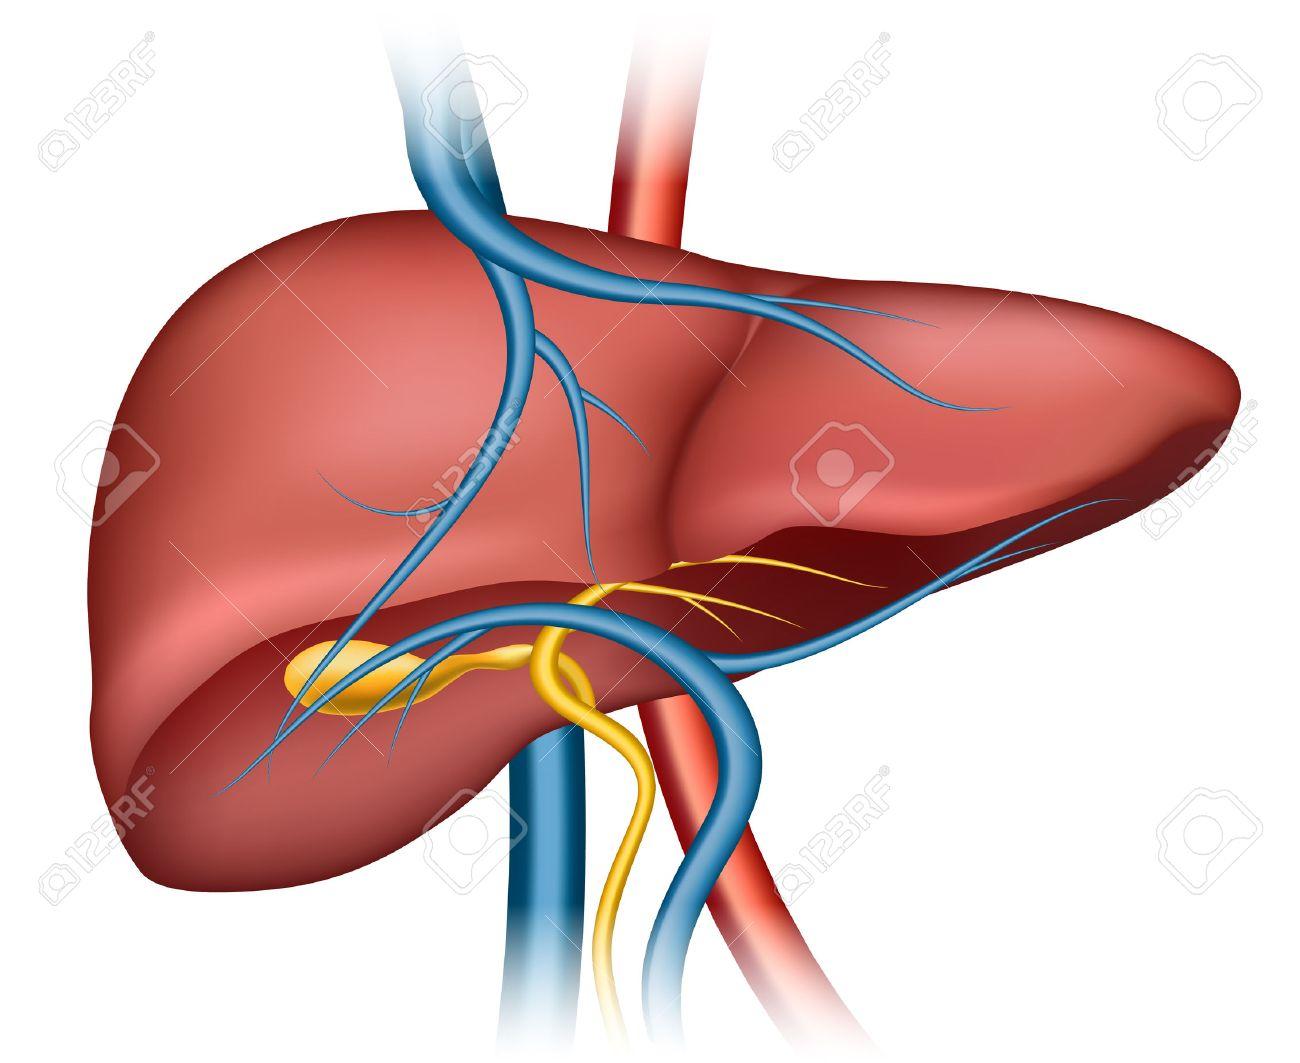 Liver clipart. Clip art images real